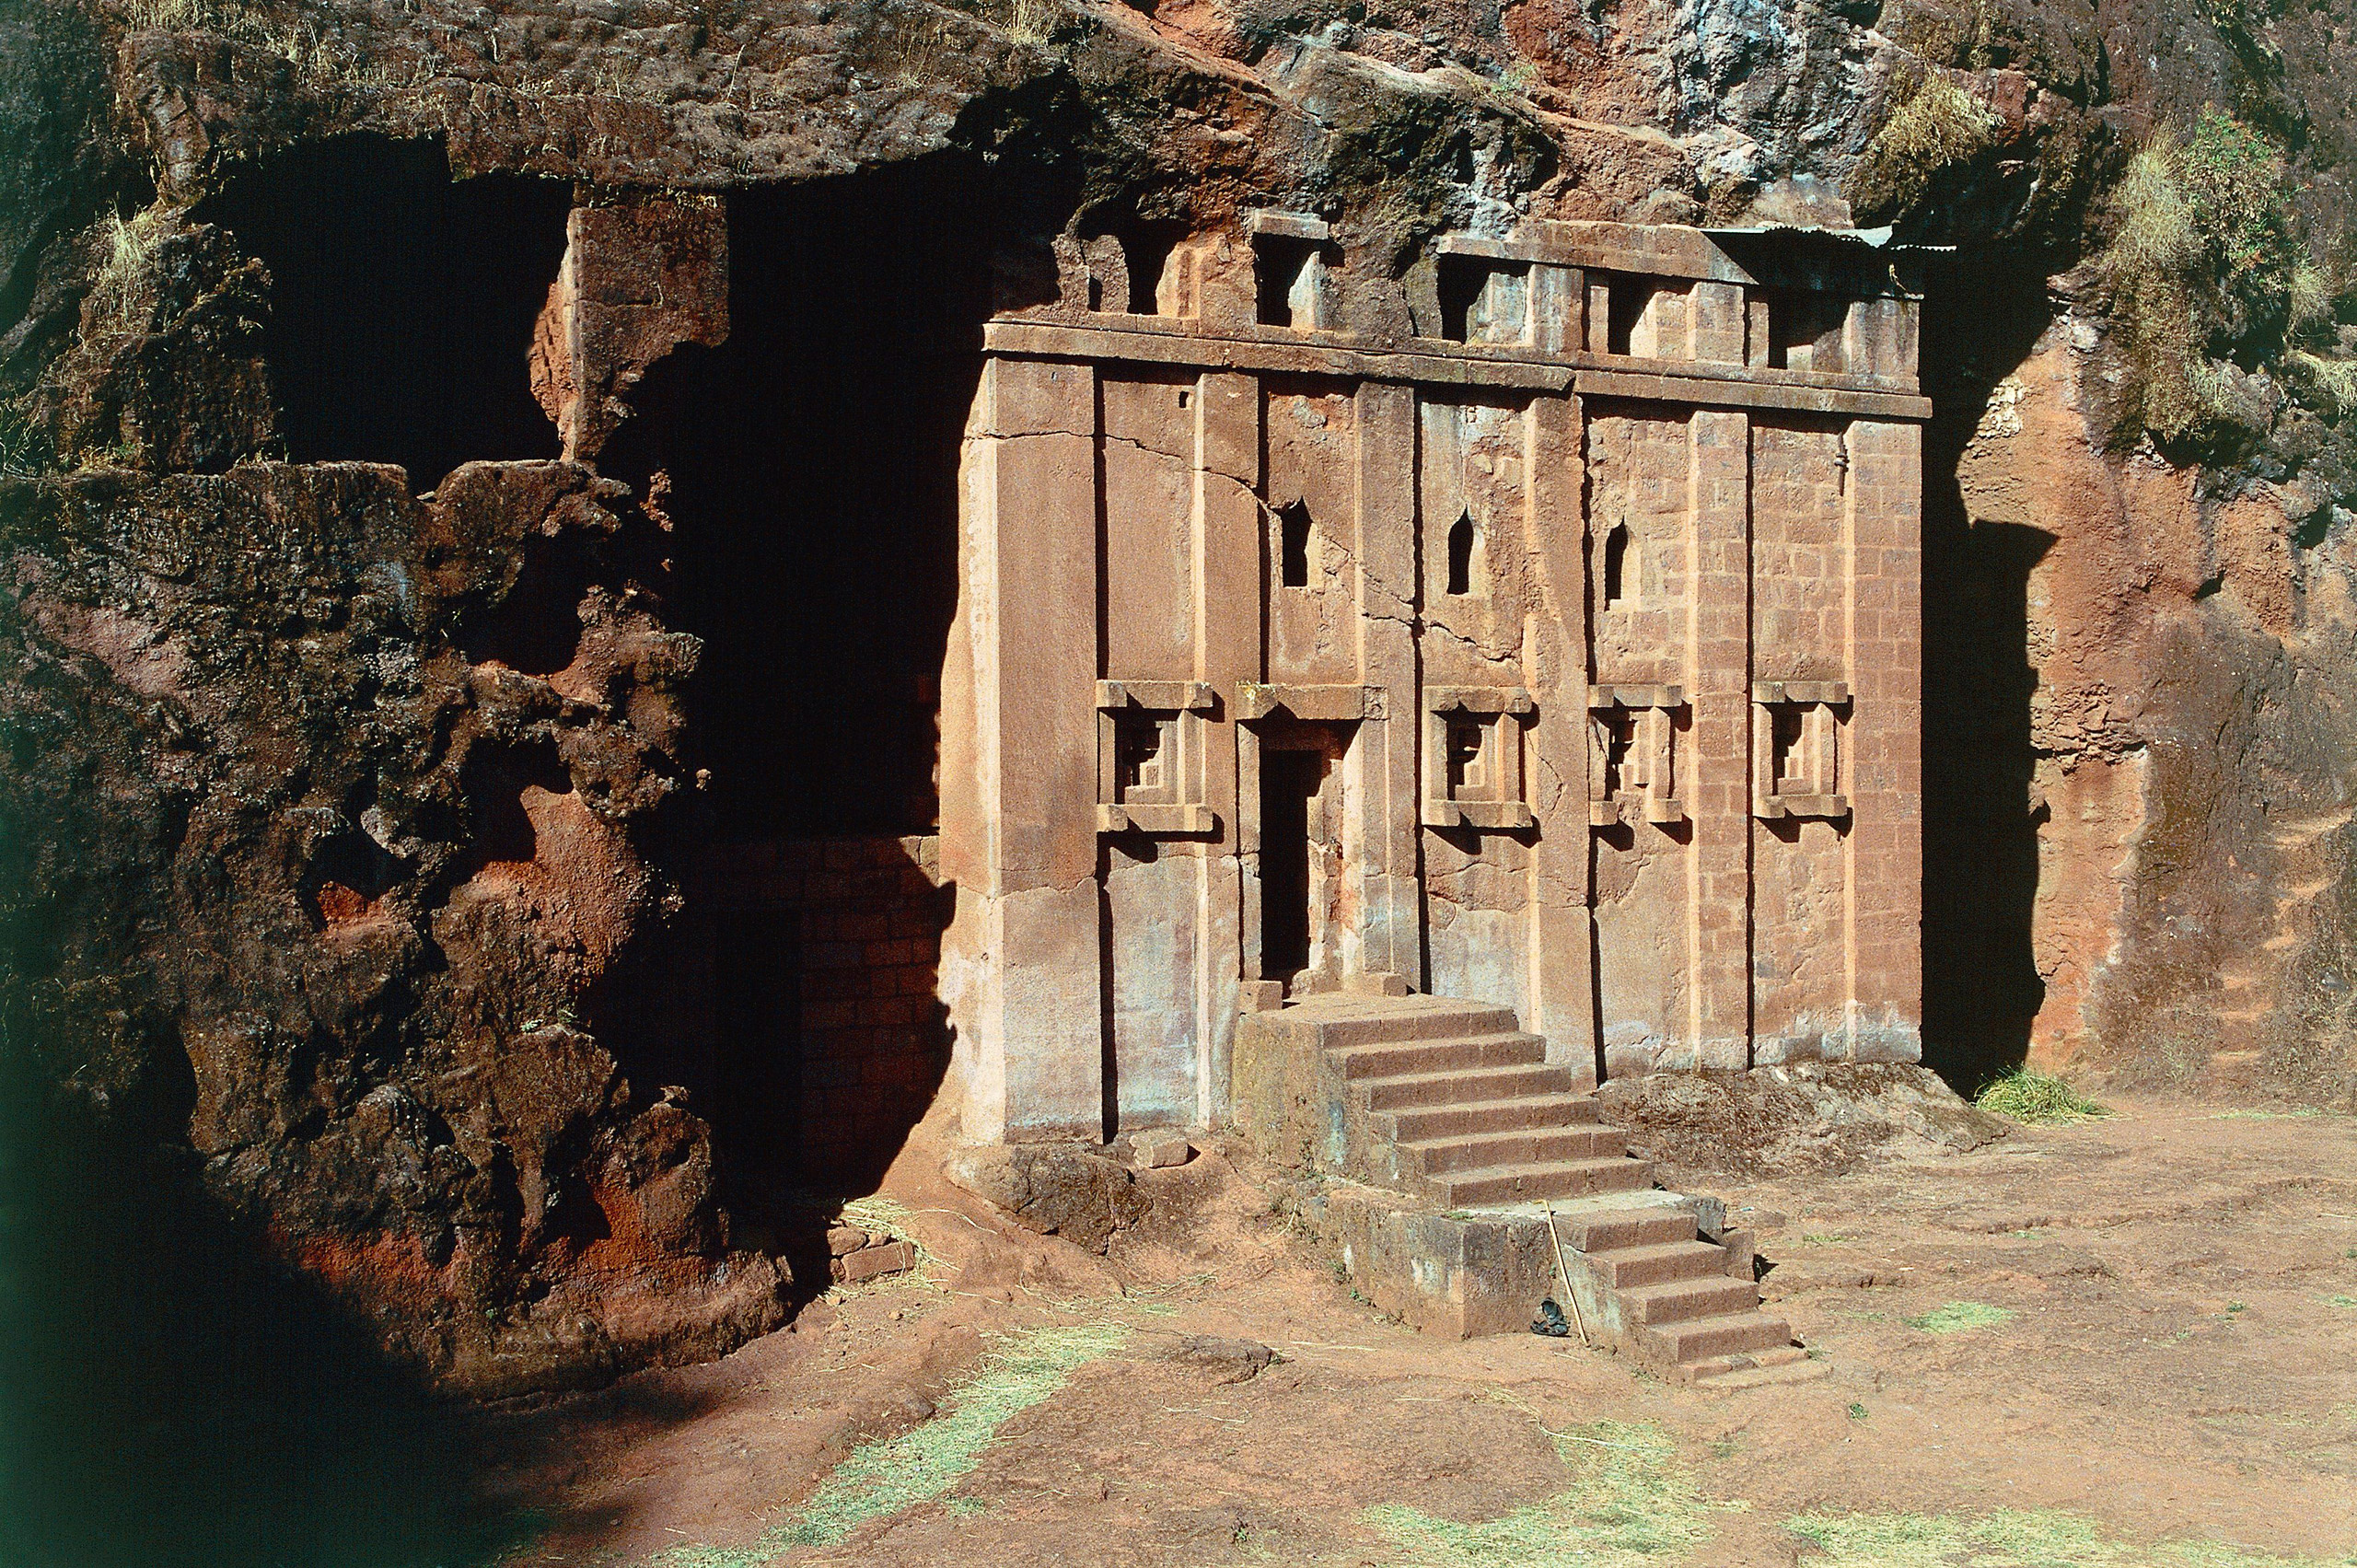 A rock-hewn church in Lalibela, Ethiopia.